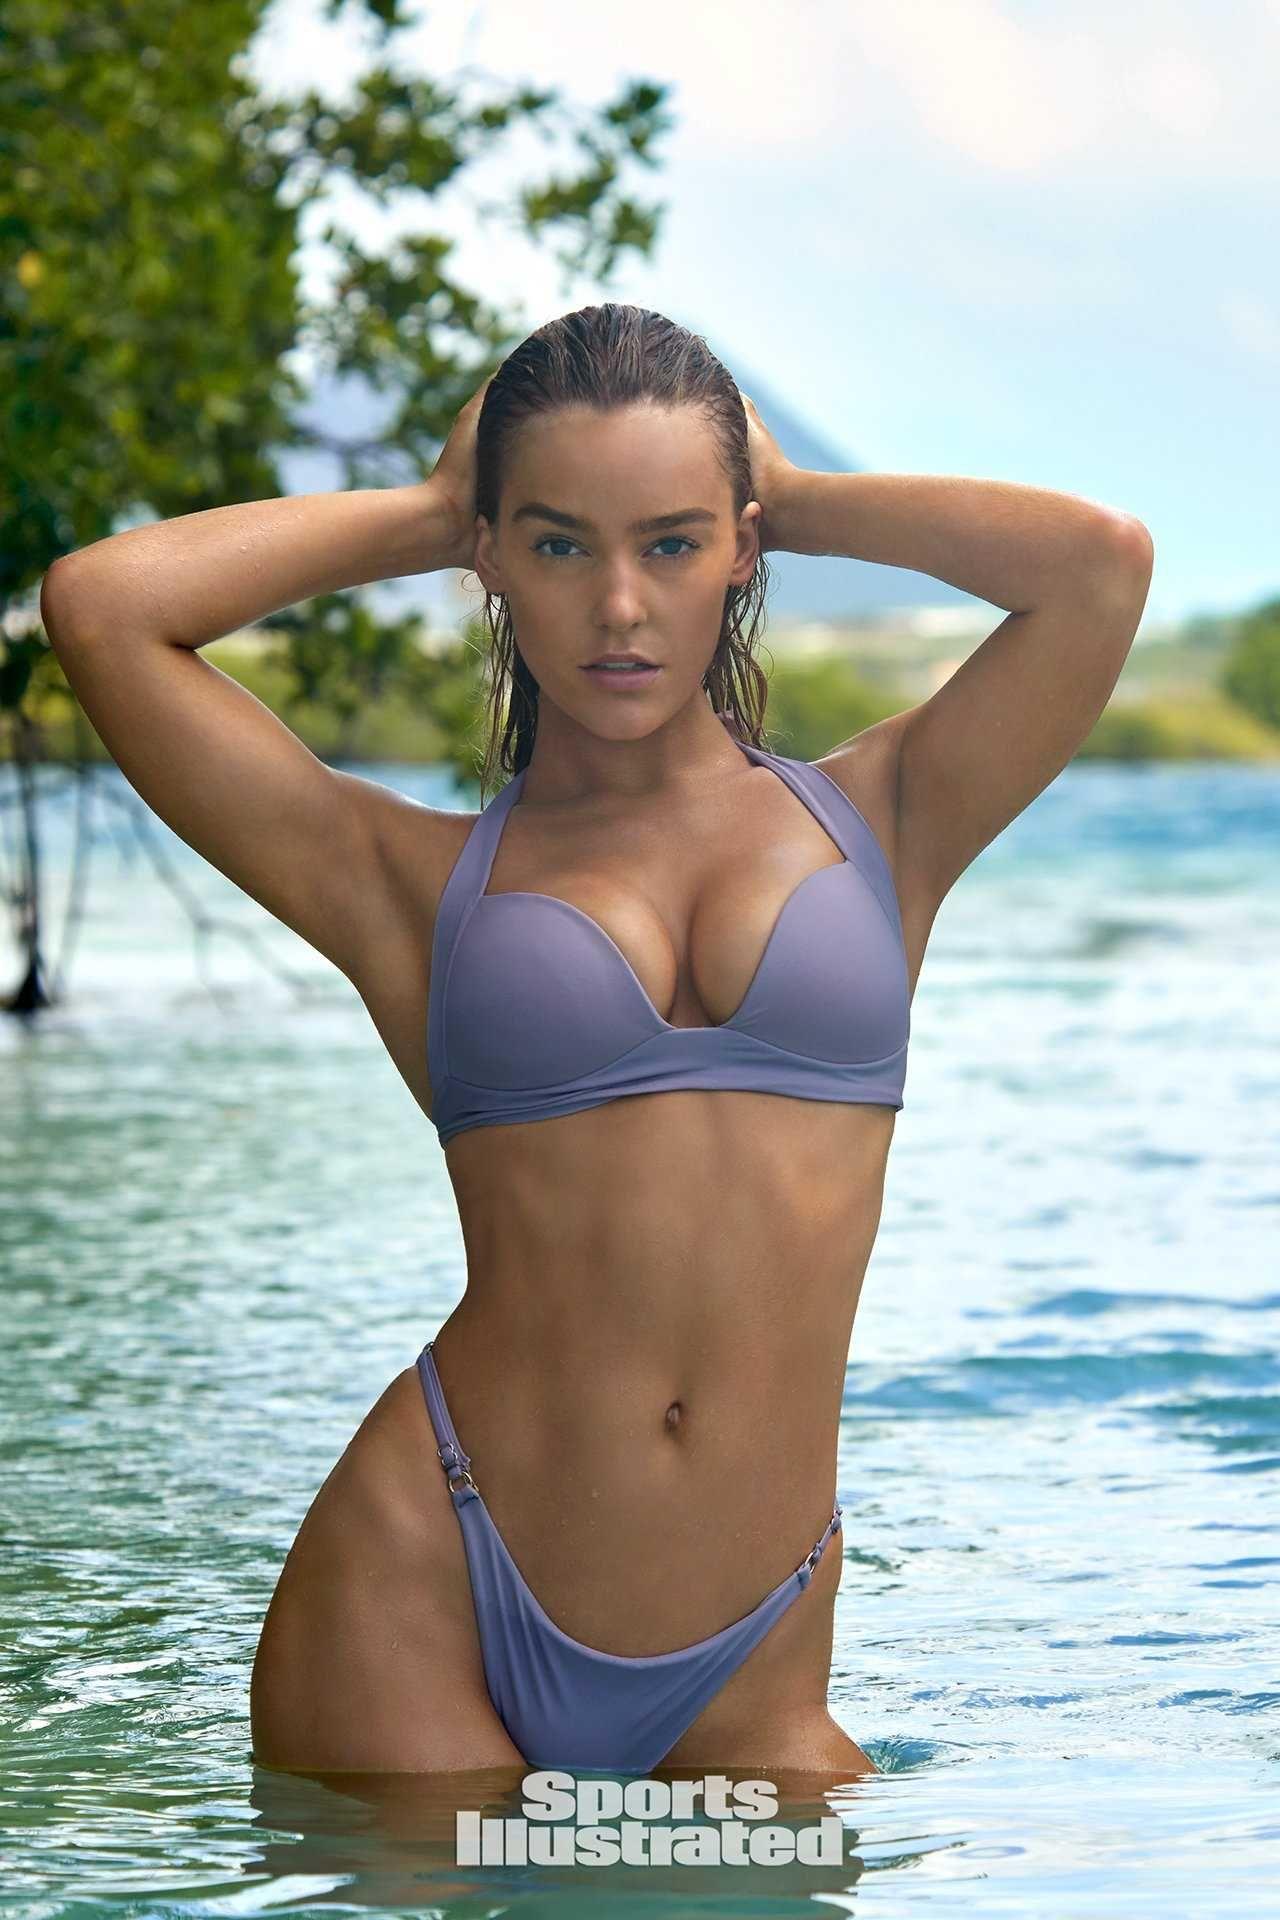 Hot Georgia Gibbs nudes (95 photo), Topless, Paparazzi, Twitter, legs 2019